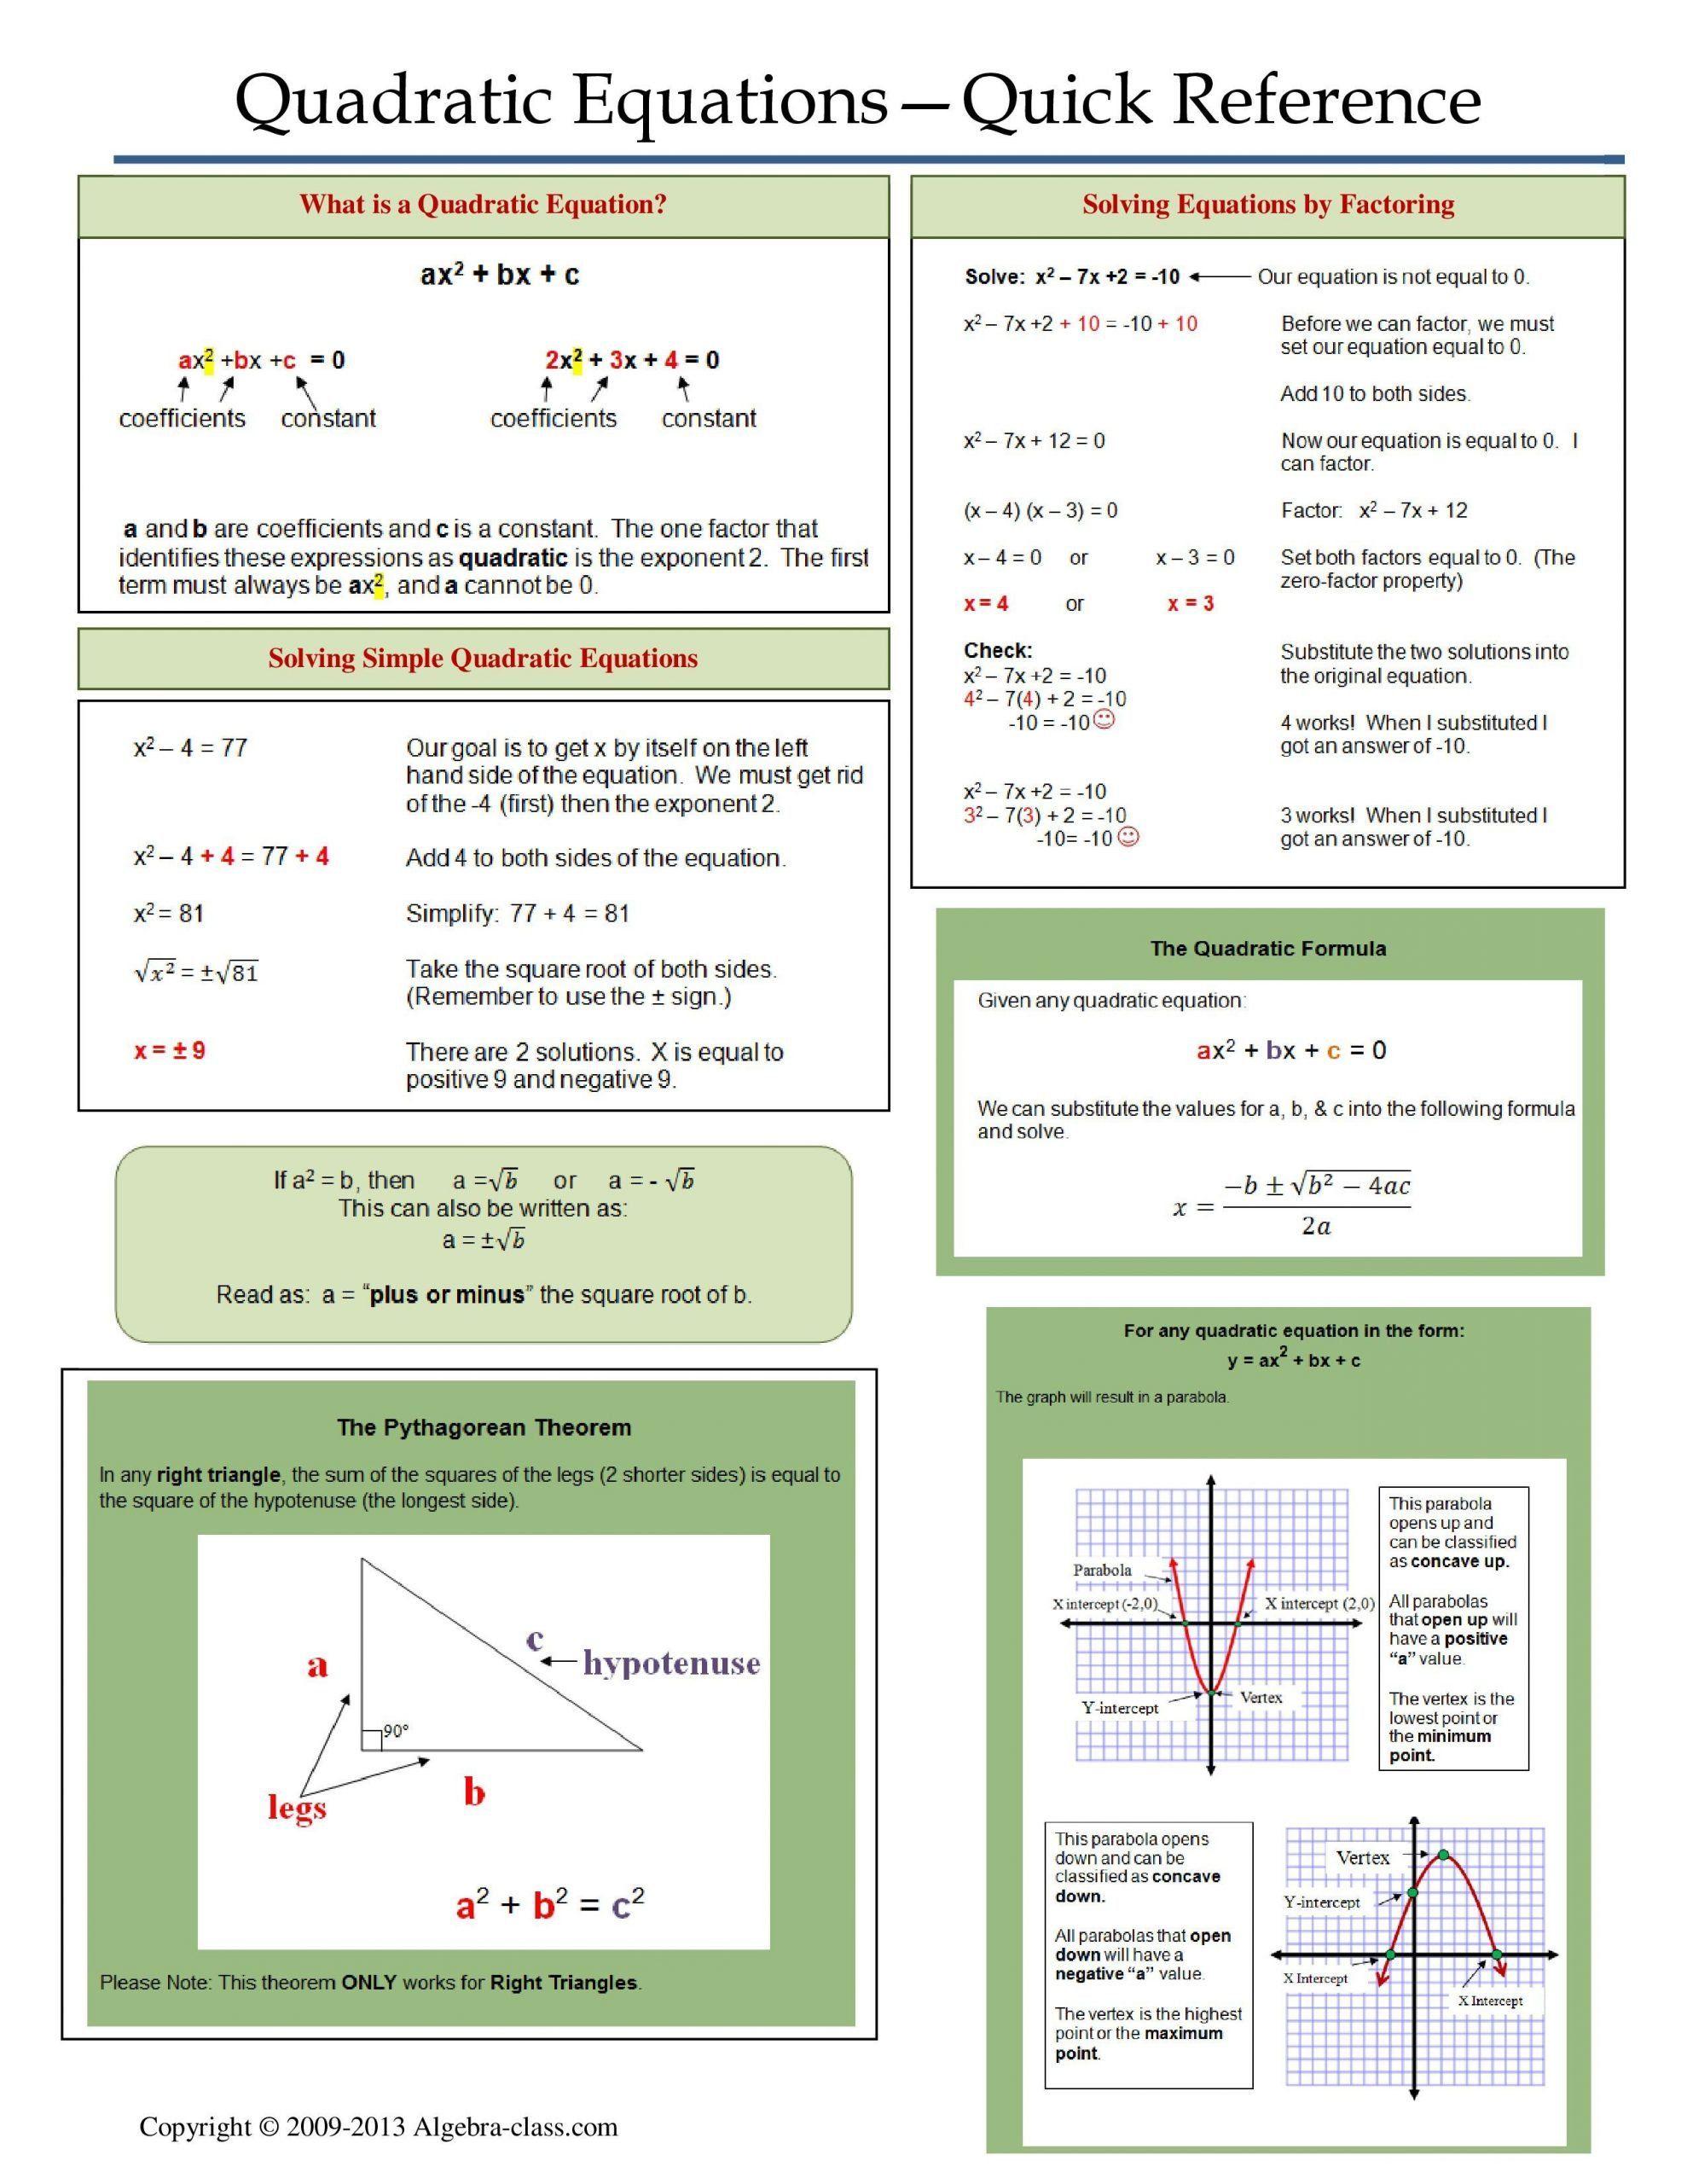 Quadratic Functions Worksheet With Answers E Page Notes Worksheet For Quadratic Equations Unit In 2020 Quadratics College Algebra College Math